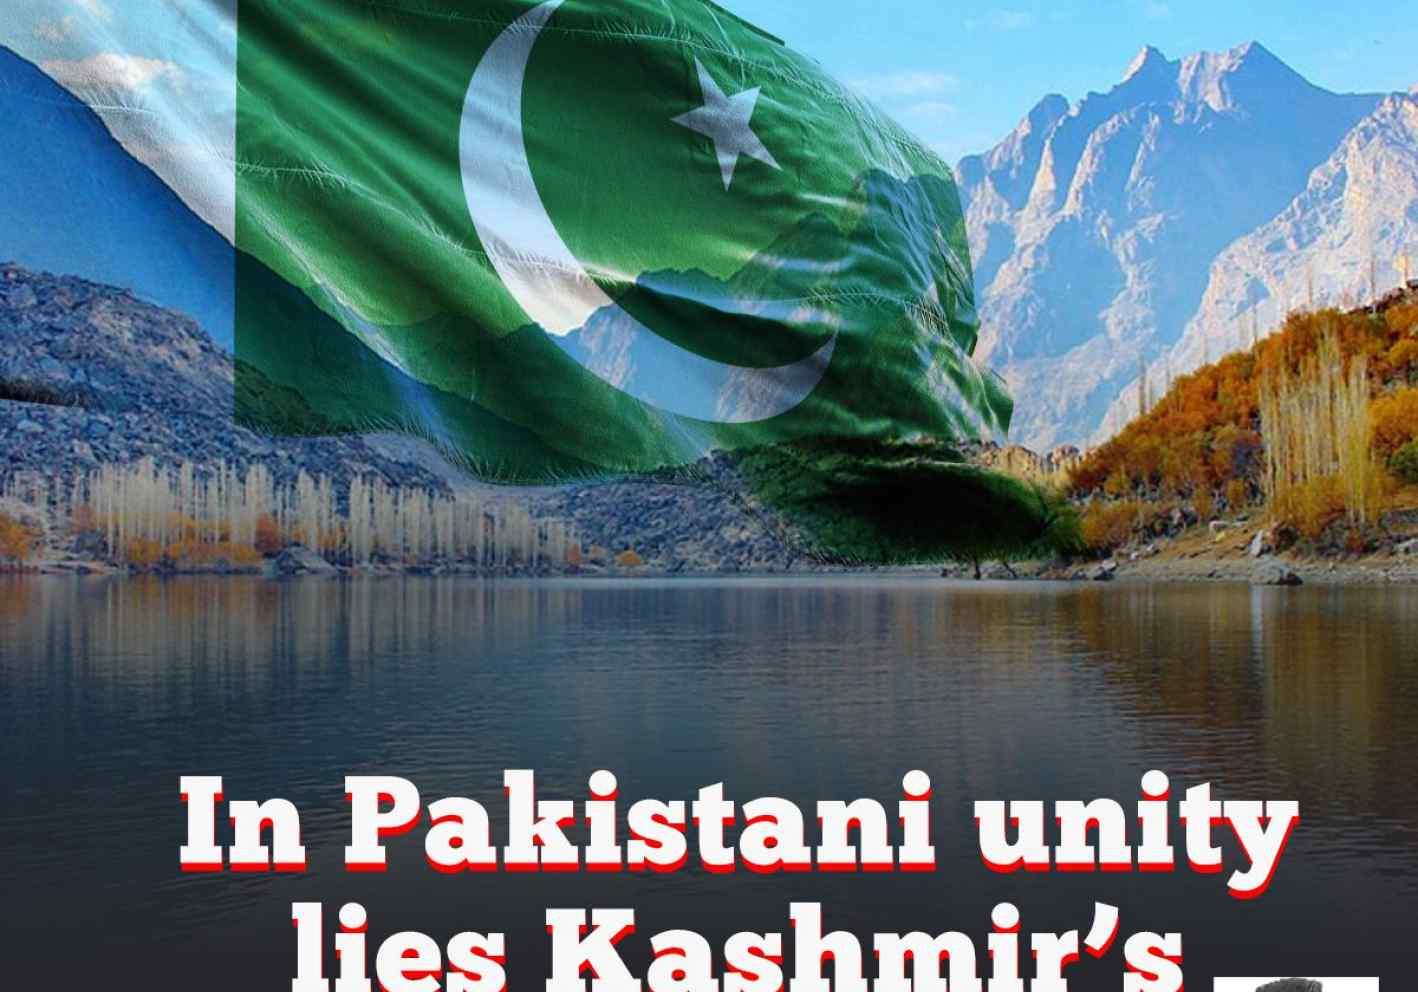 In Pakistani unity lies Kashmir's salvation